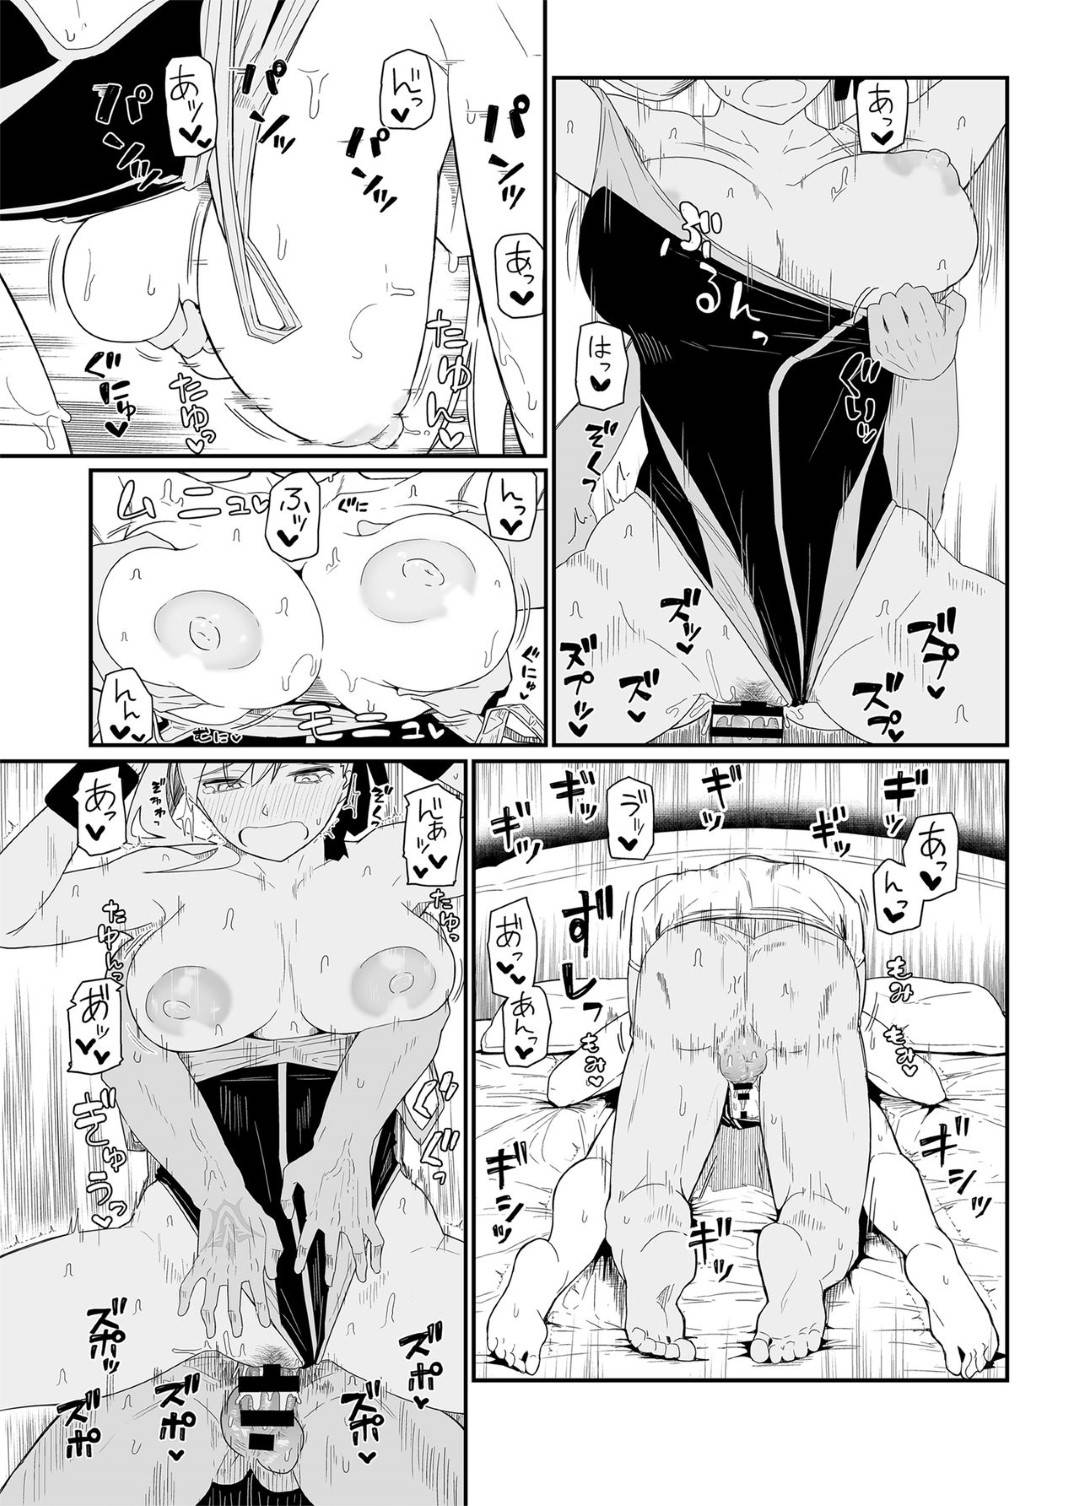 【Fateエロ漫画】主人公との一本勝負に負け、彼の好き放題される事となった武蔵。部屋に連れ込まれた彼女は乳首や膣を責められてバックでチンポを生挿入されて中出しされてしまう。【極東工務店】